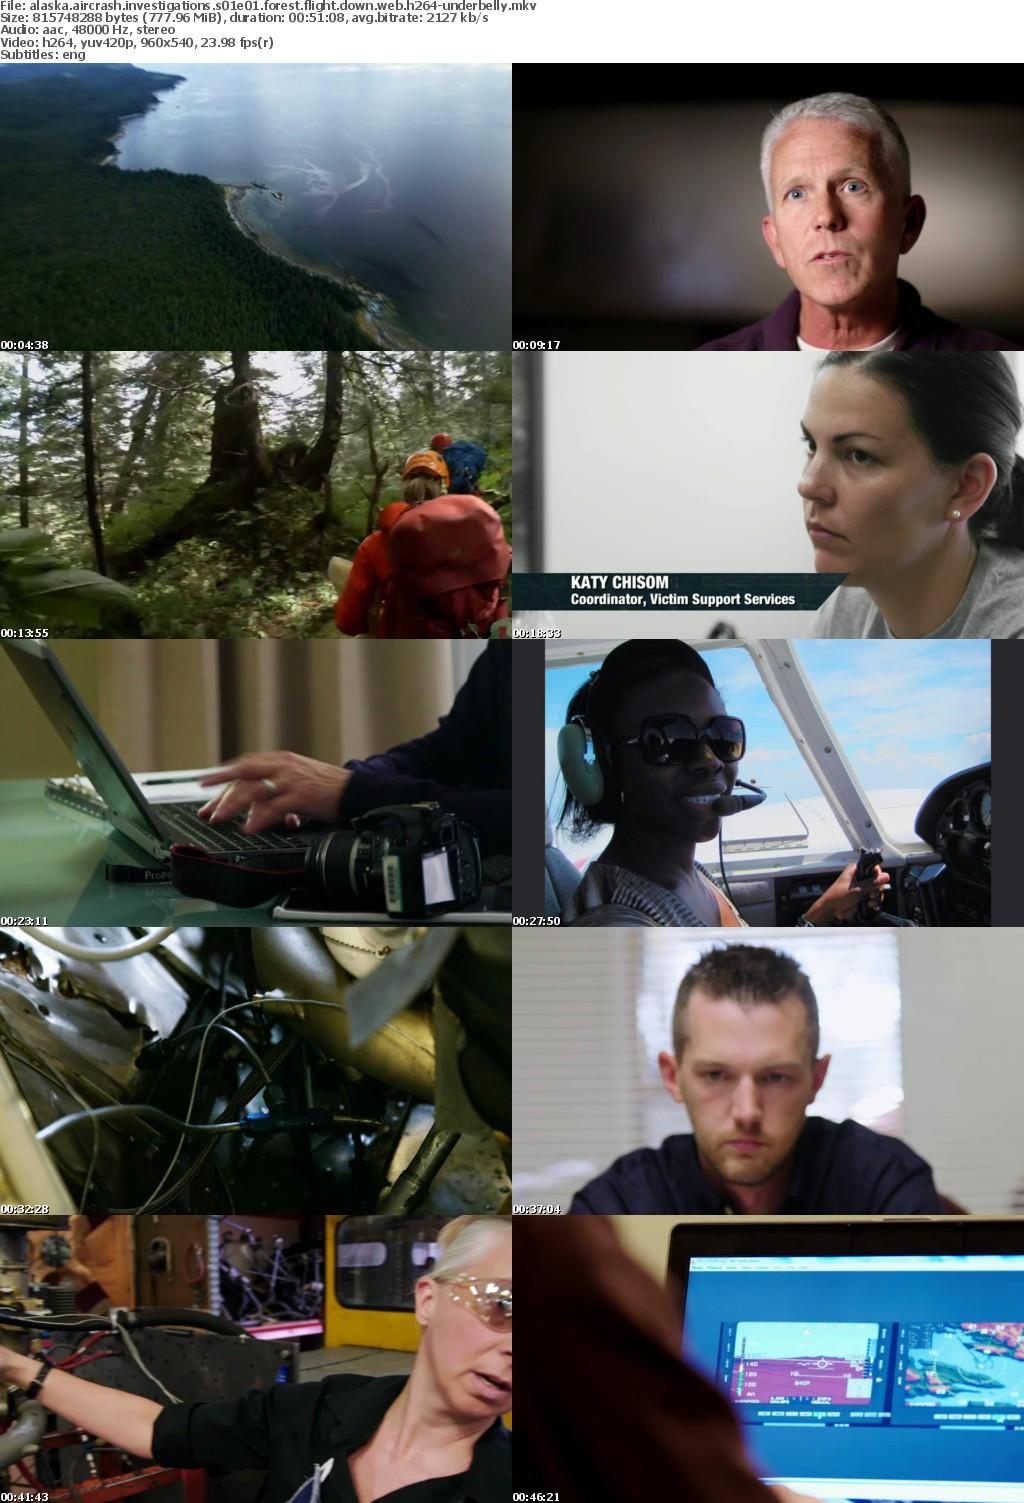 Alaska Aircrash Investigations S01E01 Forest Flight Down WEB H264-UNDERBELLY